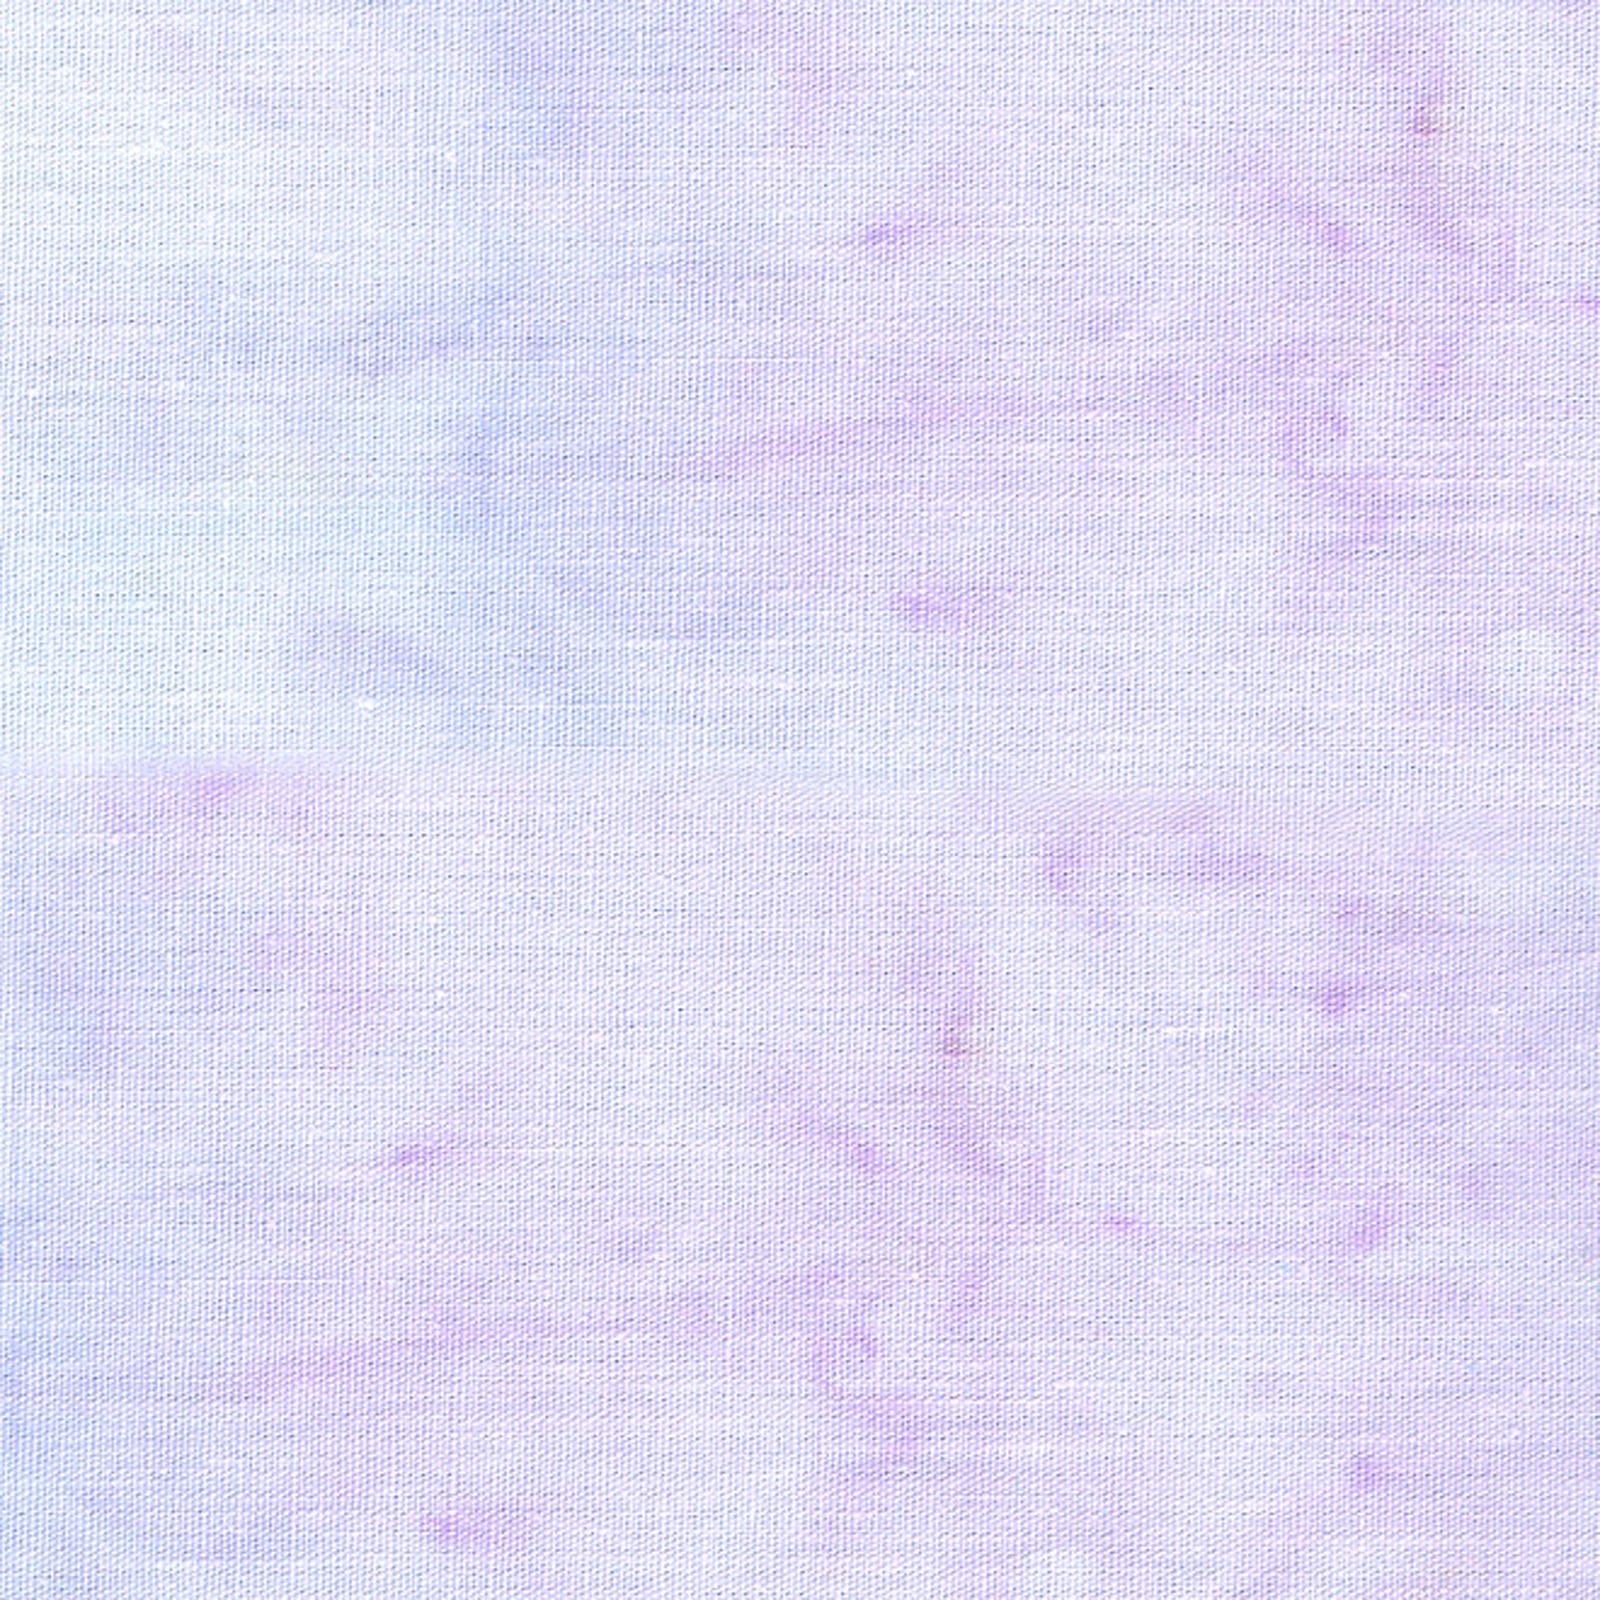 Java Rain Wash Pastel<br/>Fresh Water Designs 10-0092